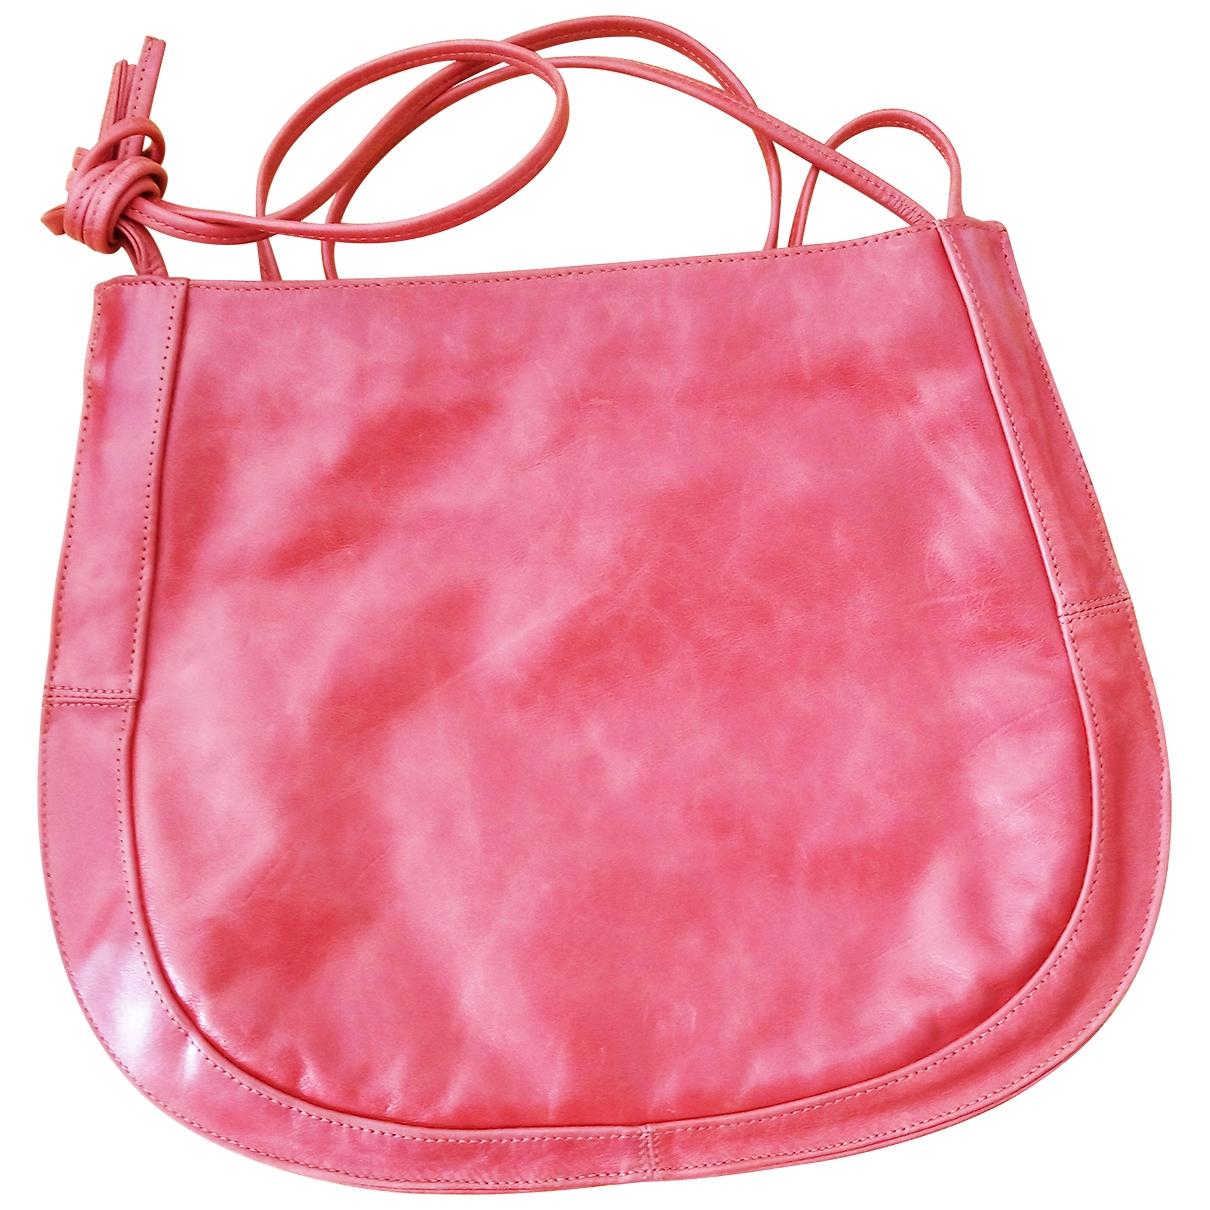 Brontibay \N Leather handbag for Women \N